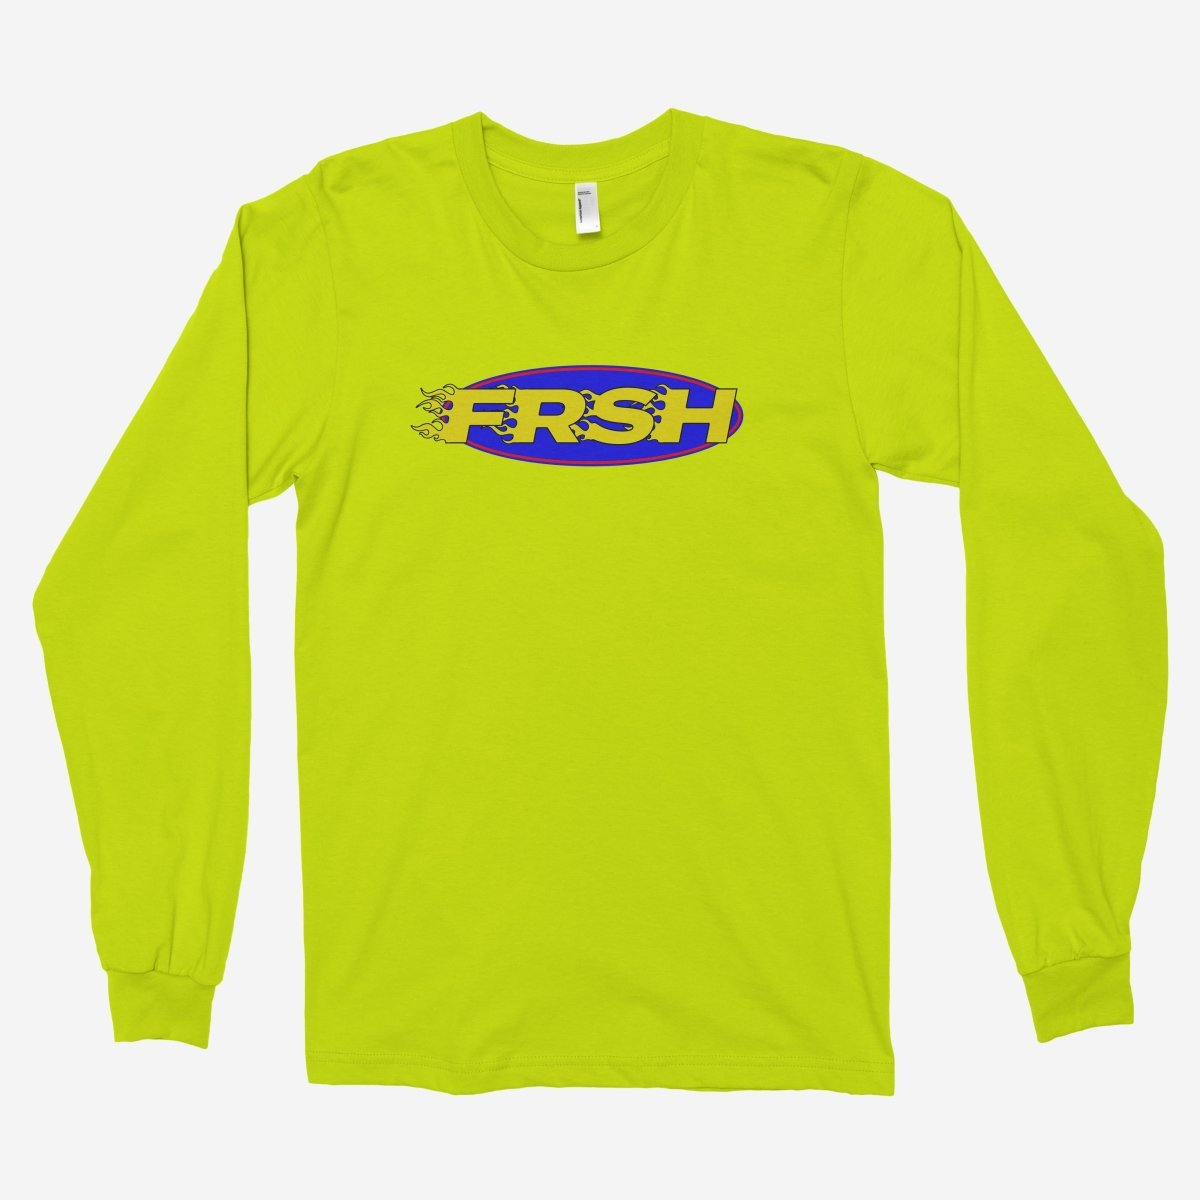 FRSH Flames Racing Unisex Long Sleeve T-Shirt